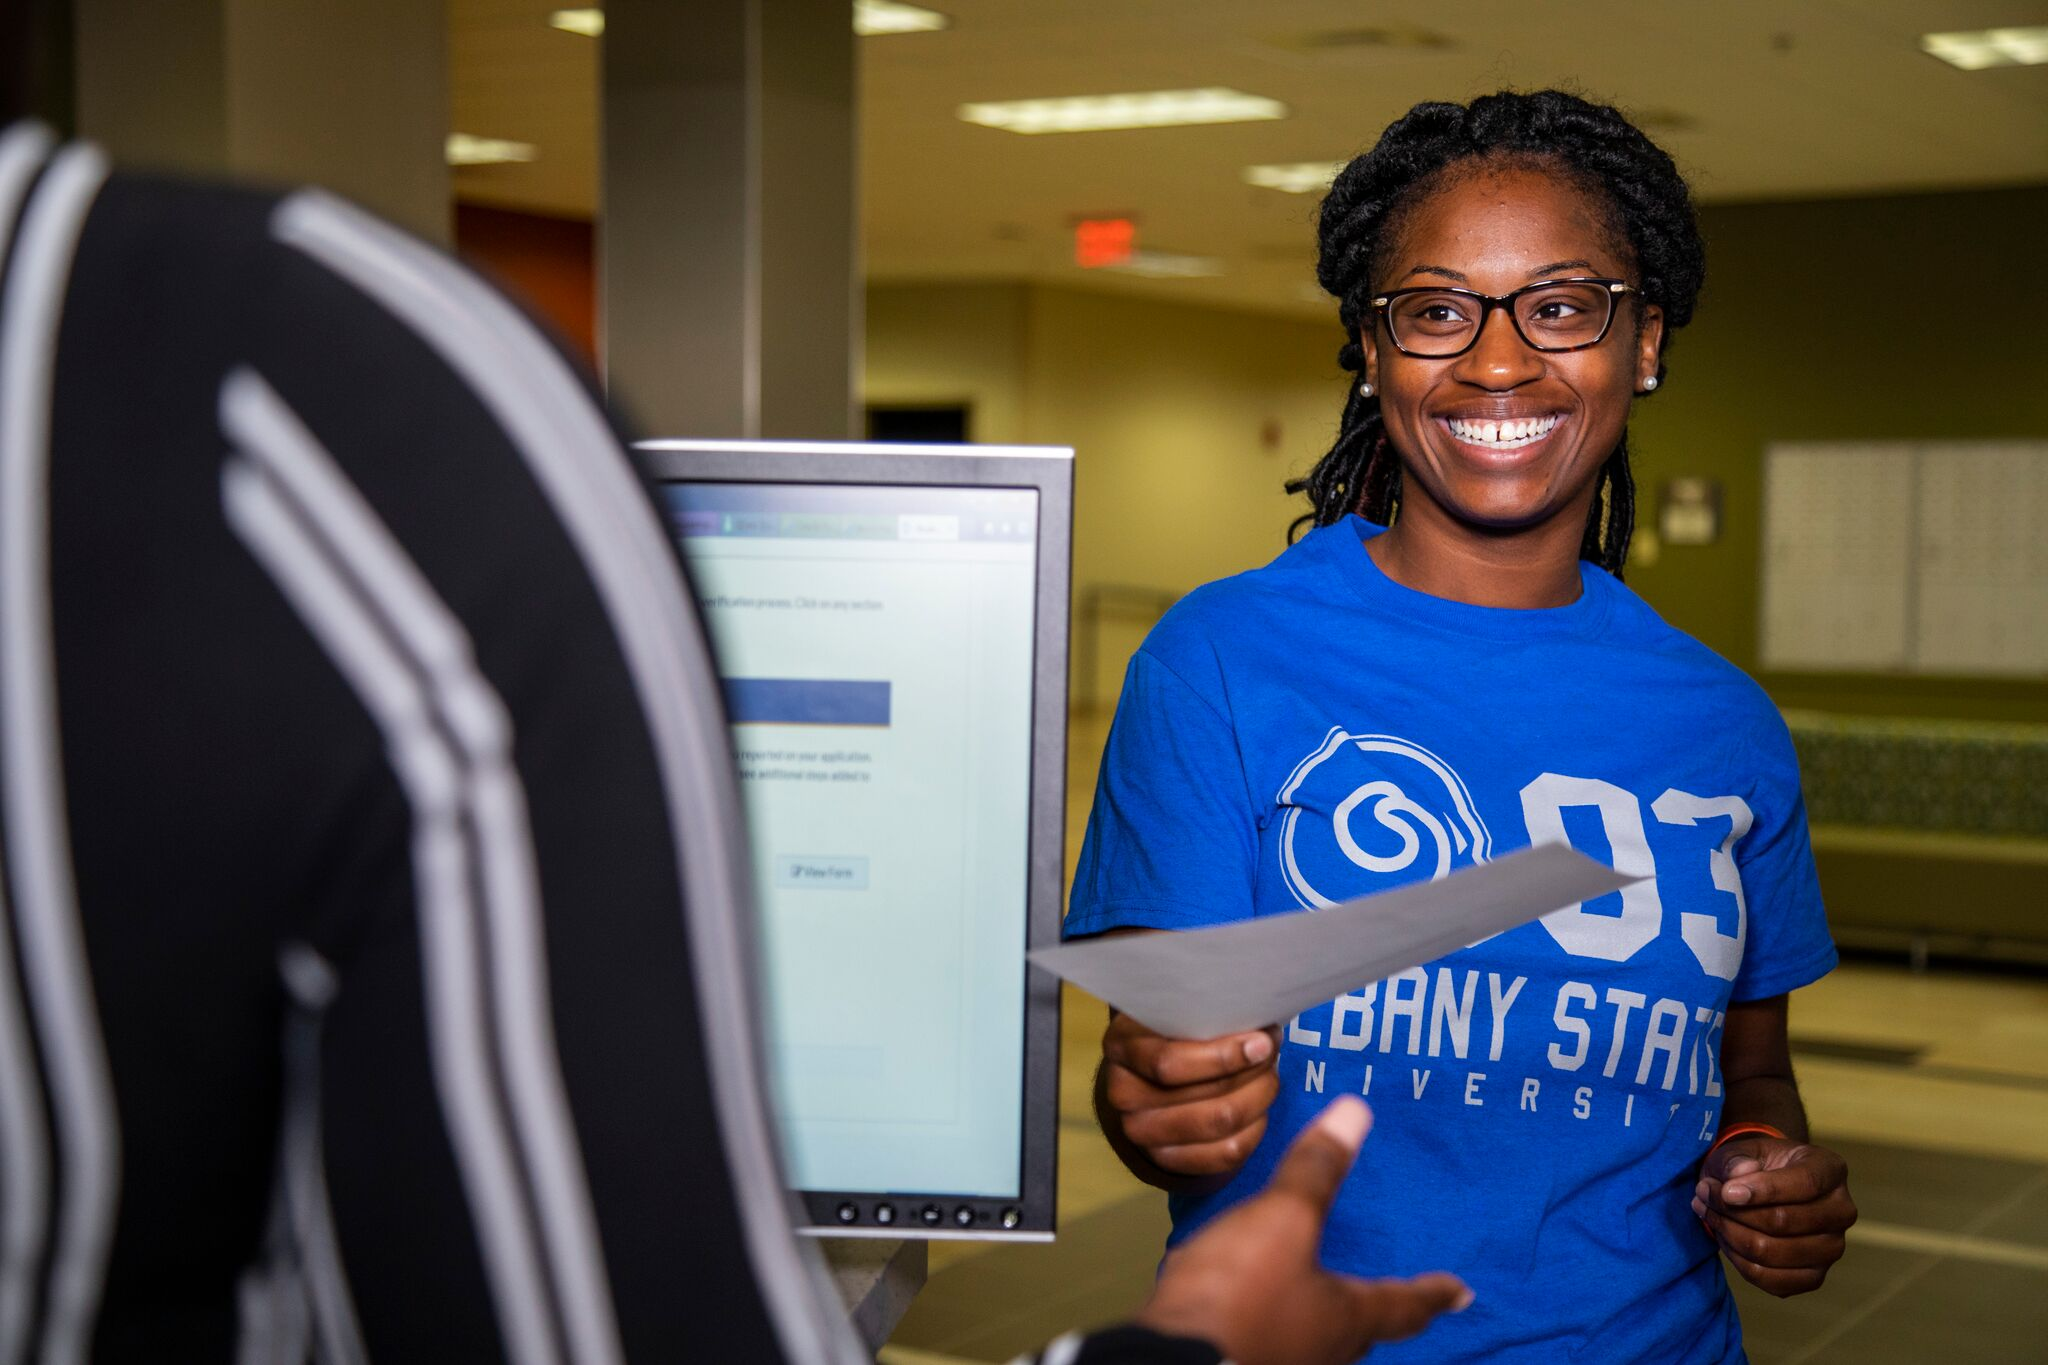 Albany student photo